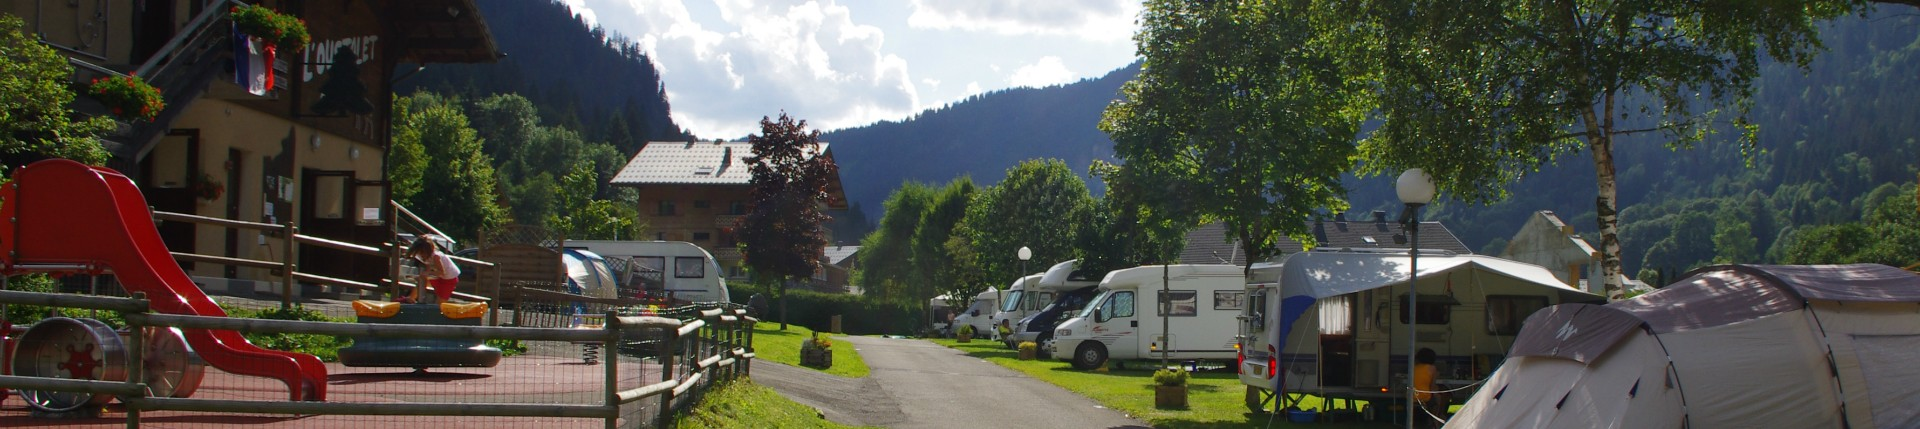 camping-vue-generale-83